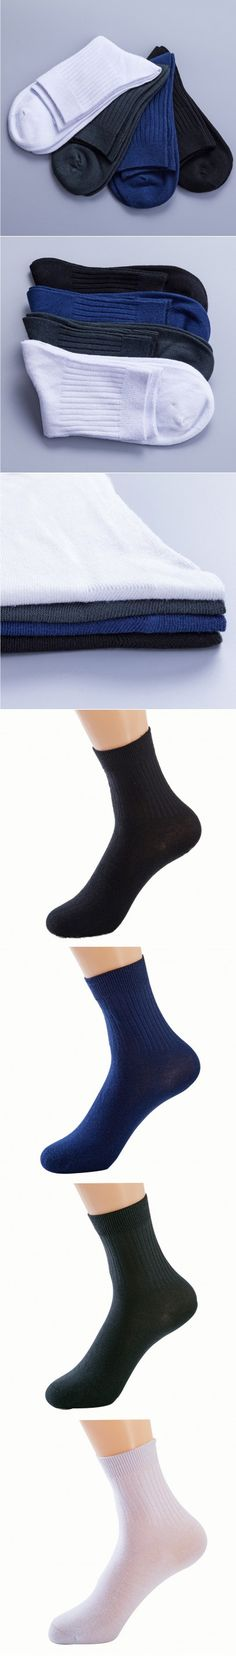 "Cotton Summer Thin Section Sweat Men's Socks(4 Pairs)  "", "" Cotton Summer Thin…"